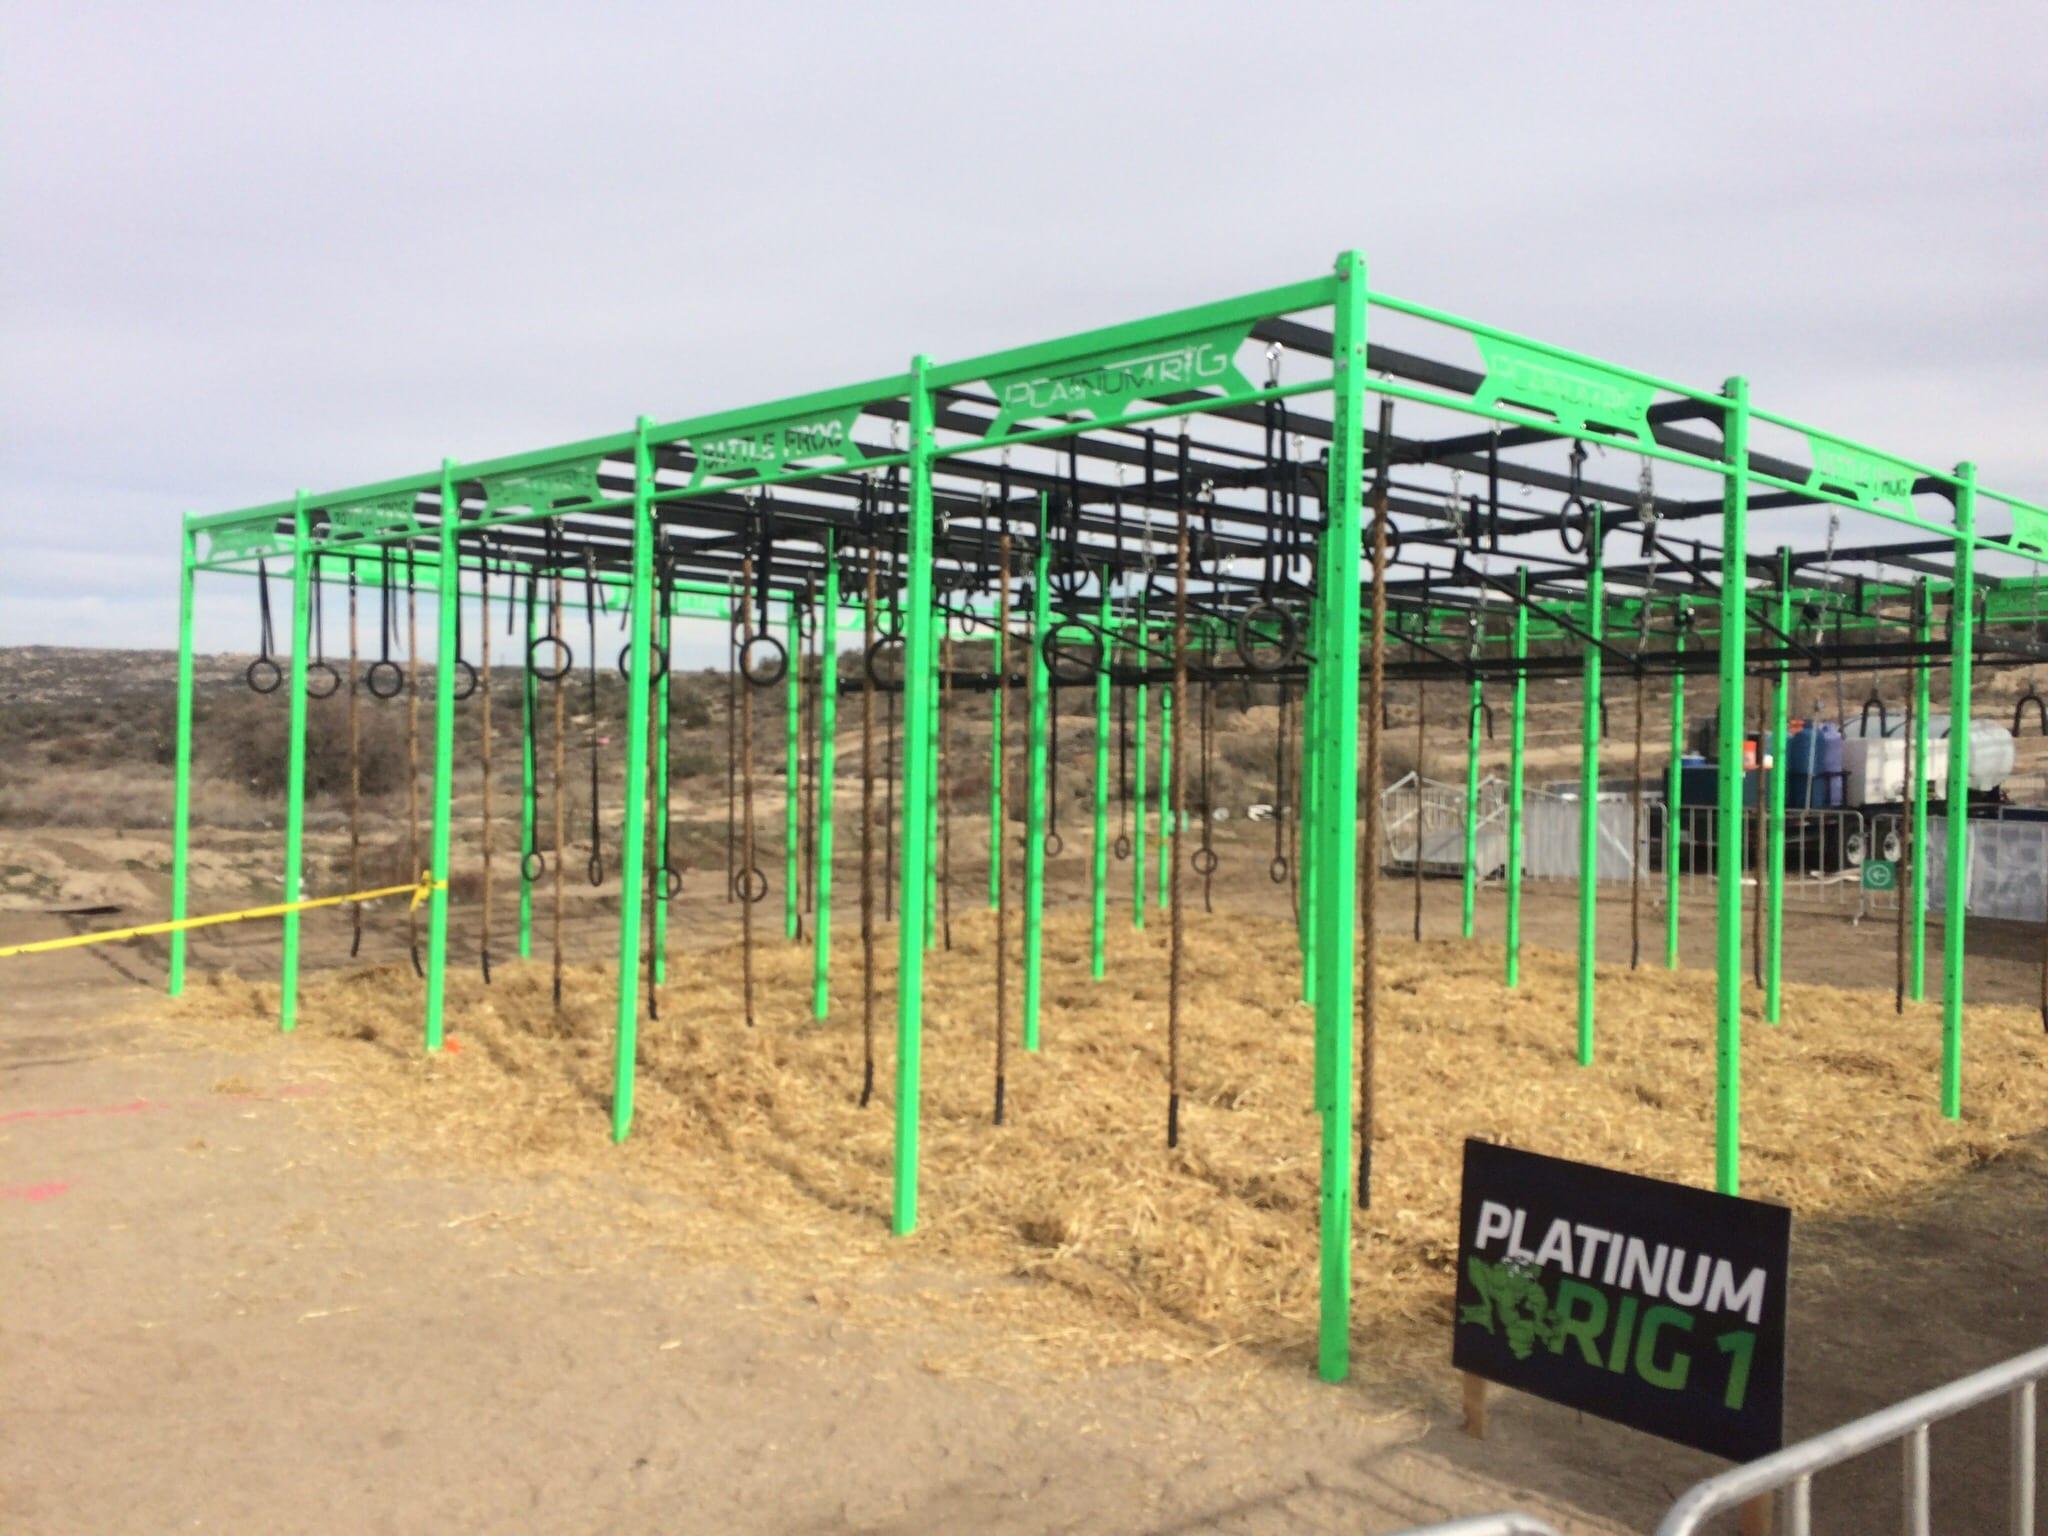 BattleFrog Platinum rig San Diego Jan 2016